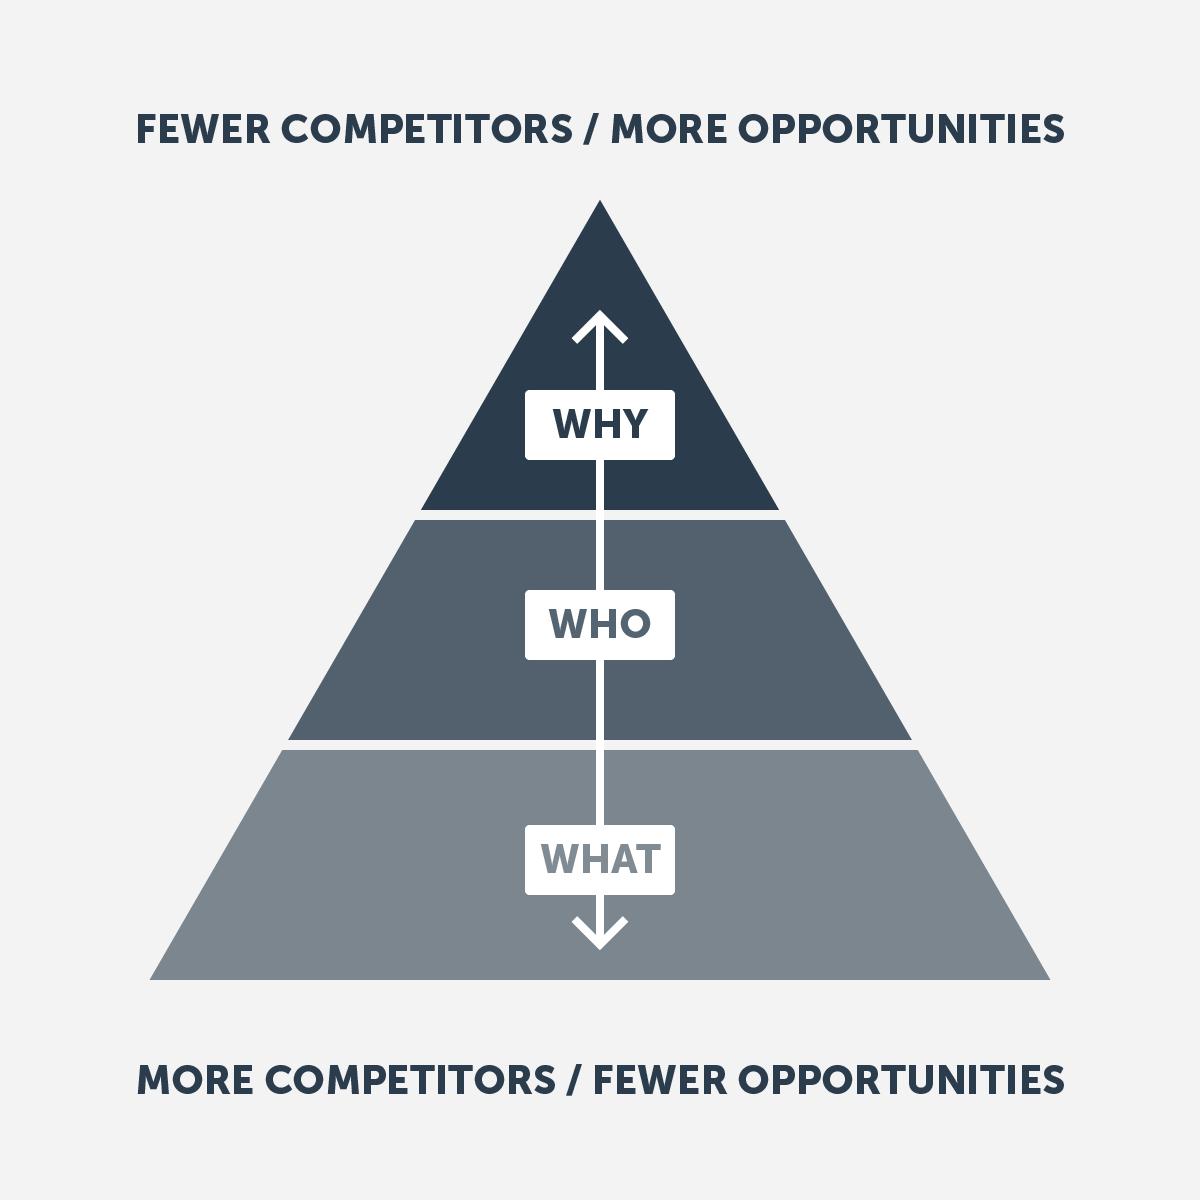 Brand story pyramid